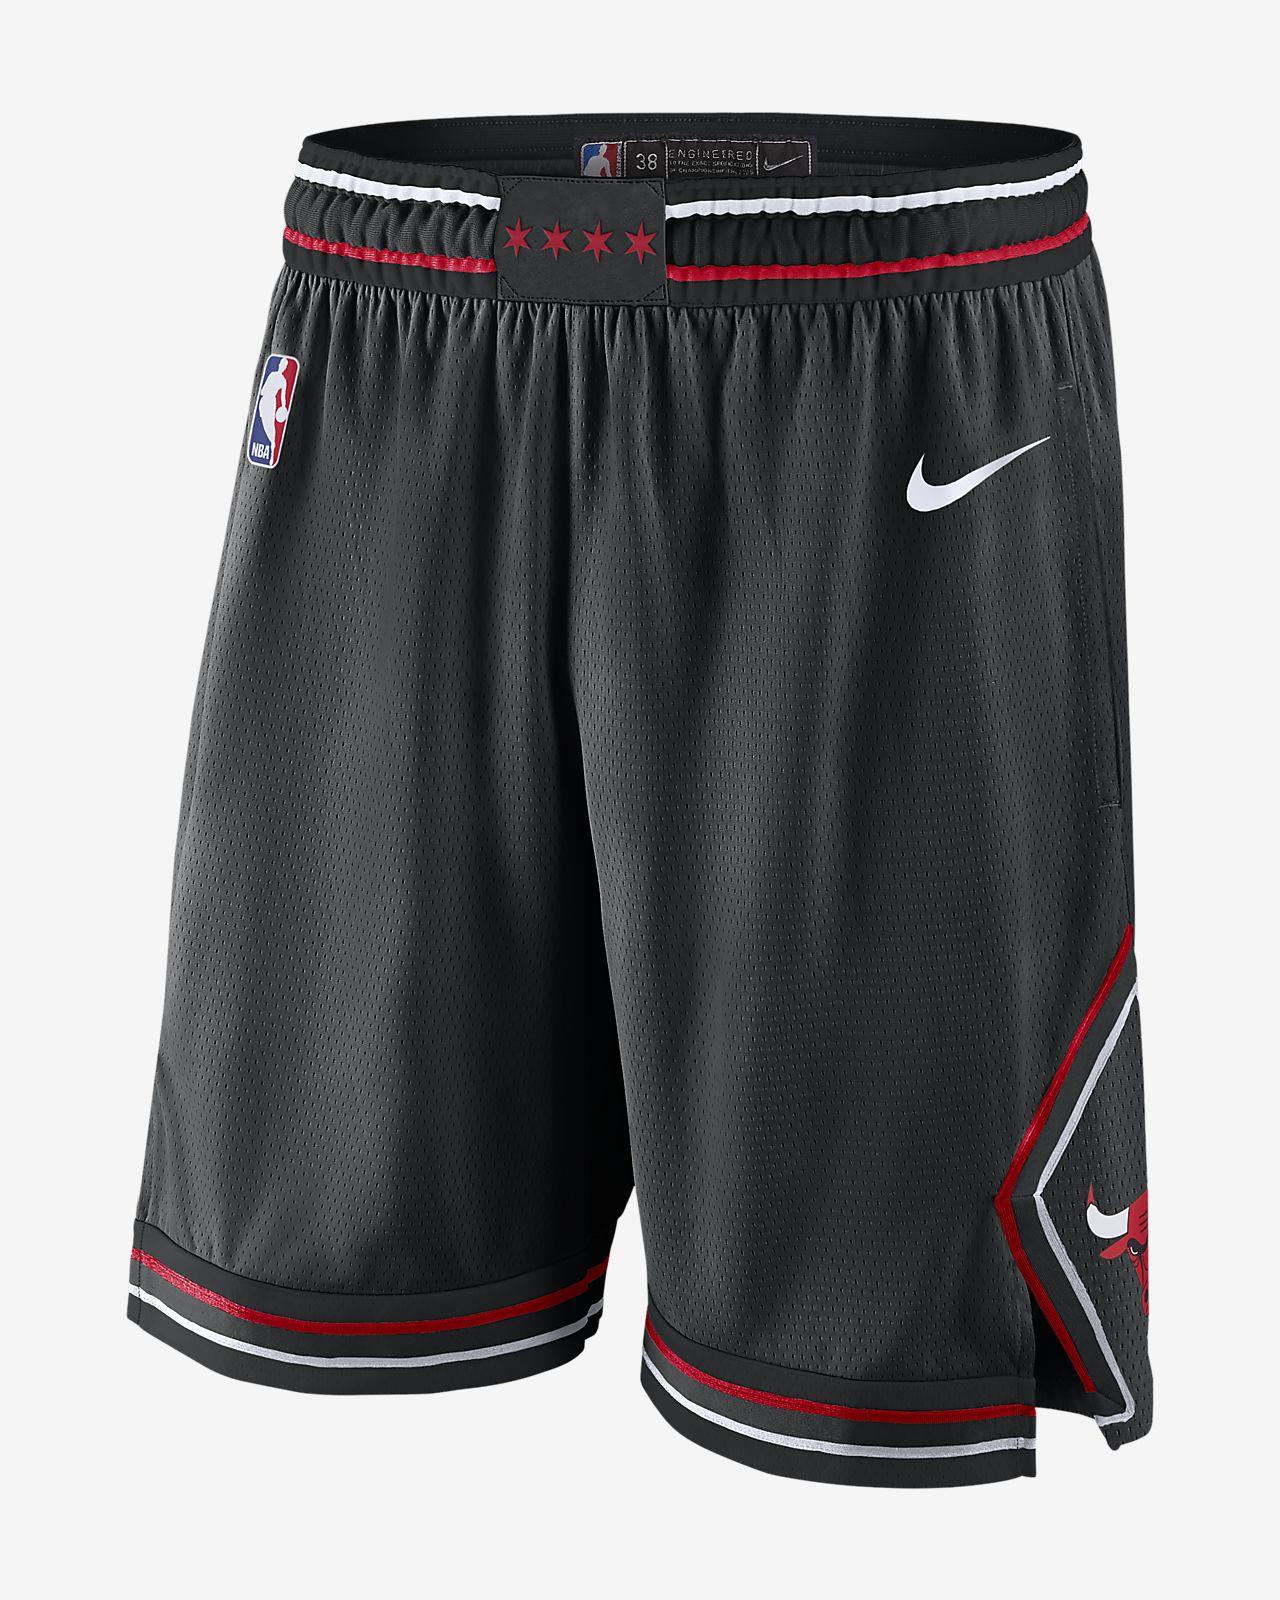 Calções NBA Nike Chicago Bulls Statement Edition Swingman para homem ... 28d3c8aa2ce62